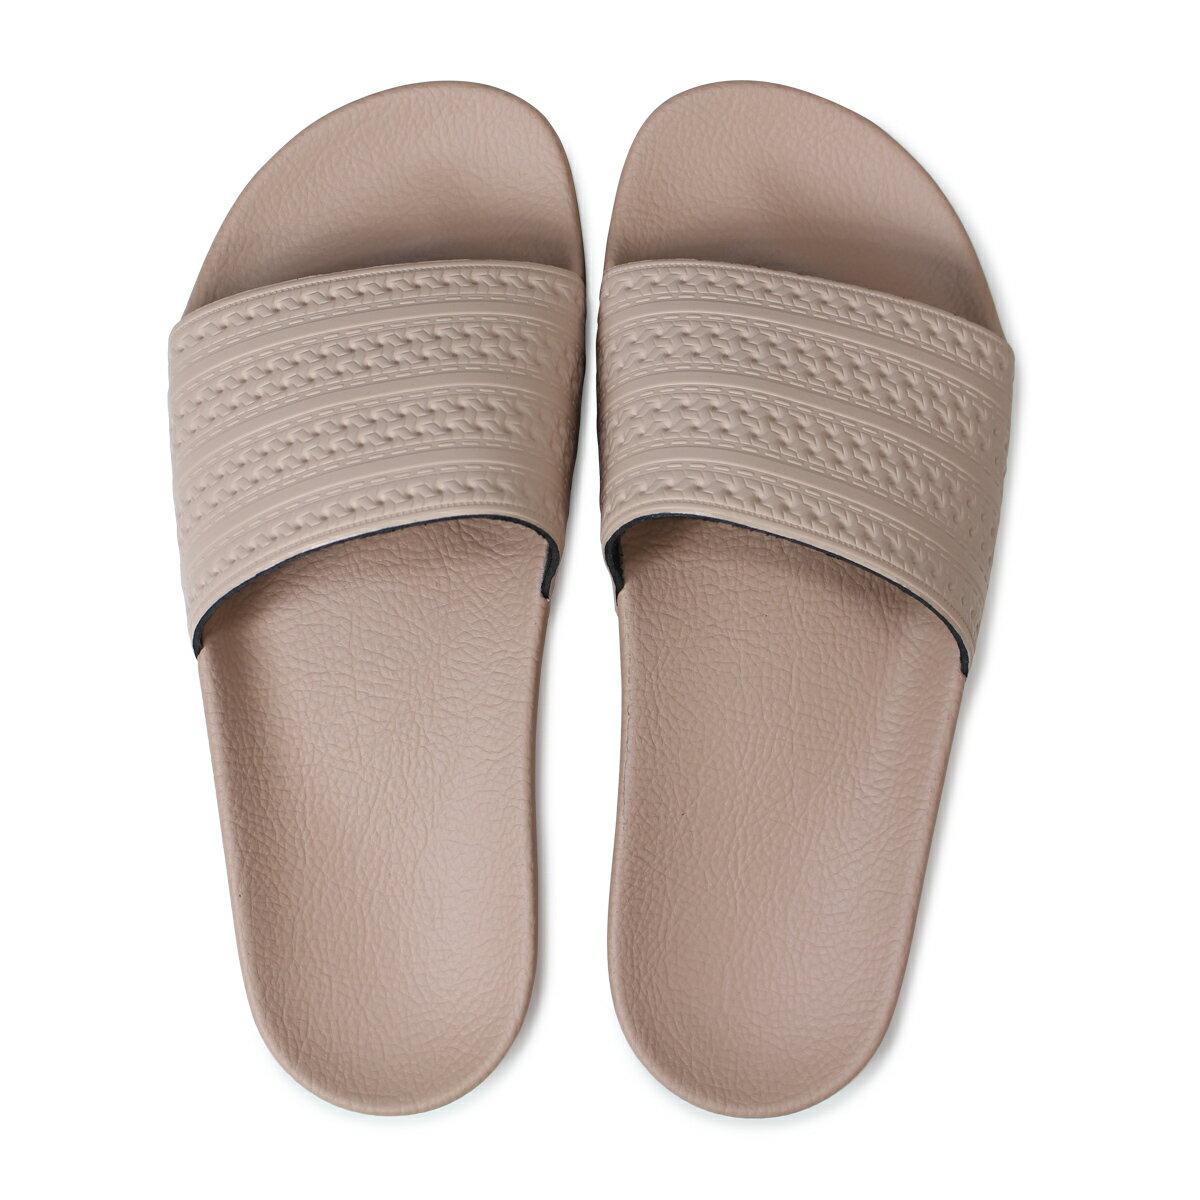 adidas Originals WOMENS ADILETTE SLIDES アディダス アディレッタ レディース サンダル シャワーサンダル CQ2235 ピンクベージュ オリジナルス [予約商品 4/19頃入荷予定 新入荷] [184]